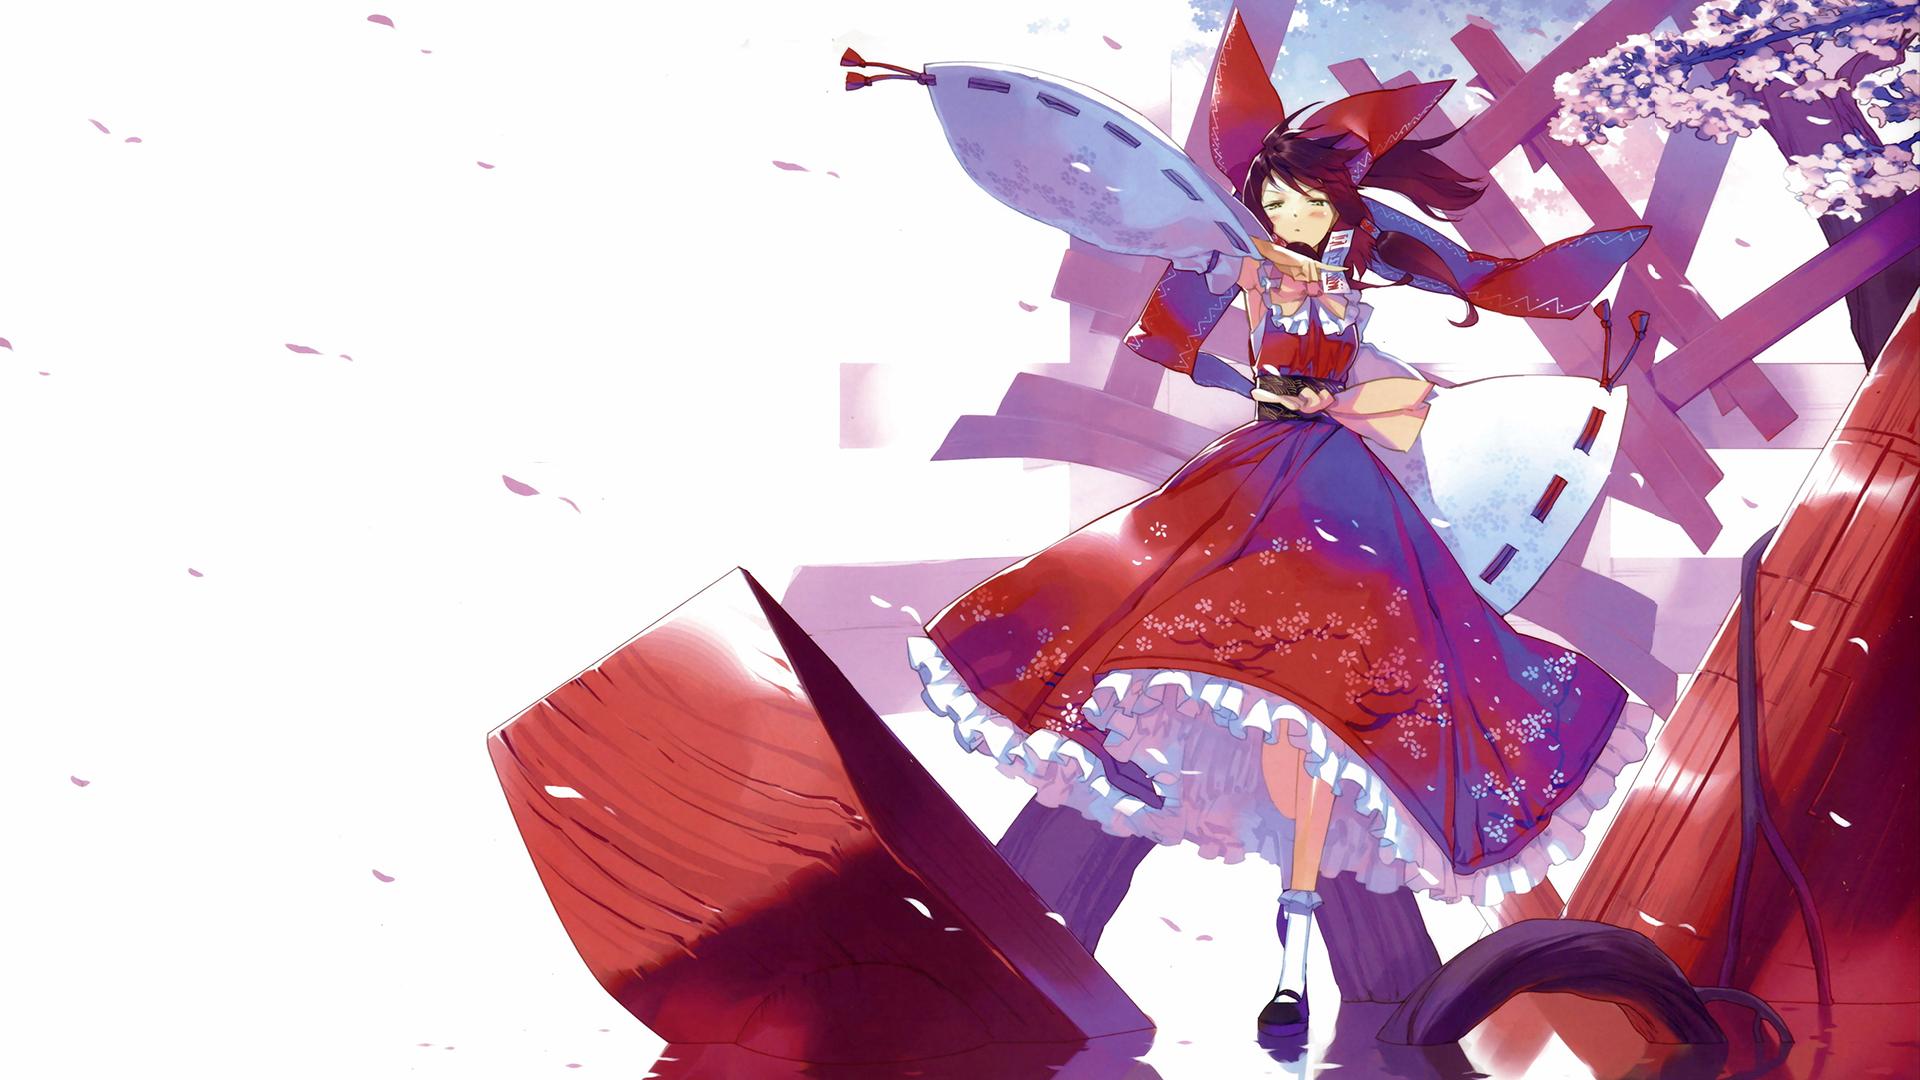 Anime 1920x1080 anime girls solo El Rey Solo